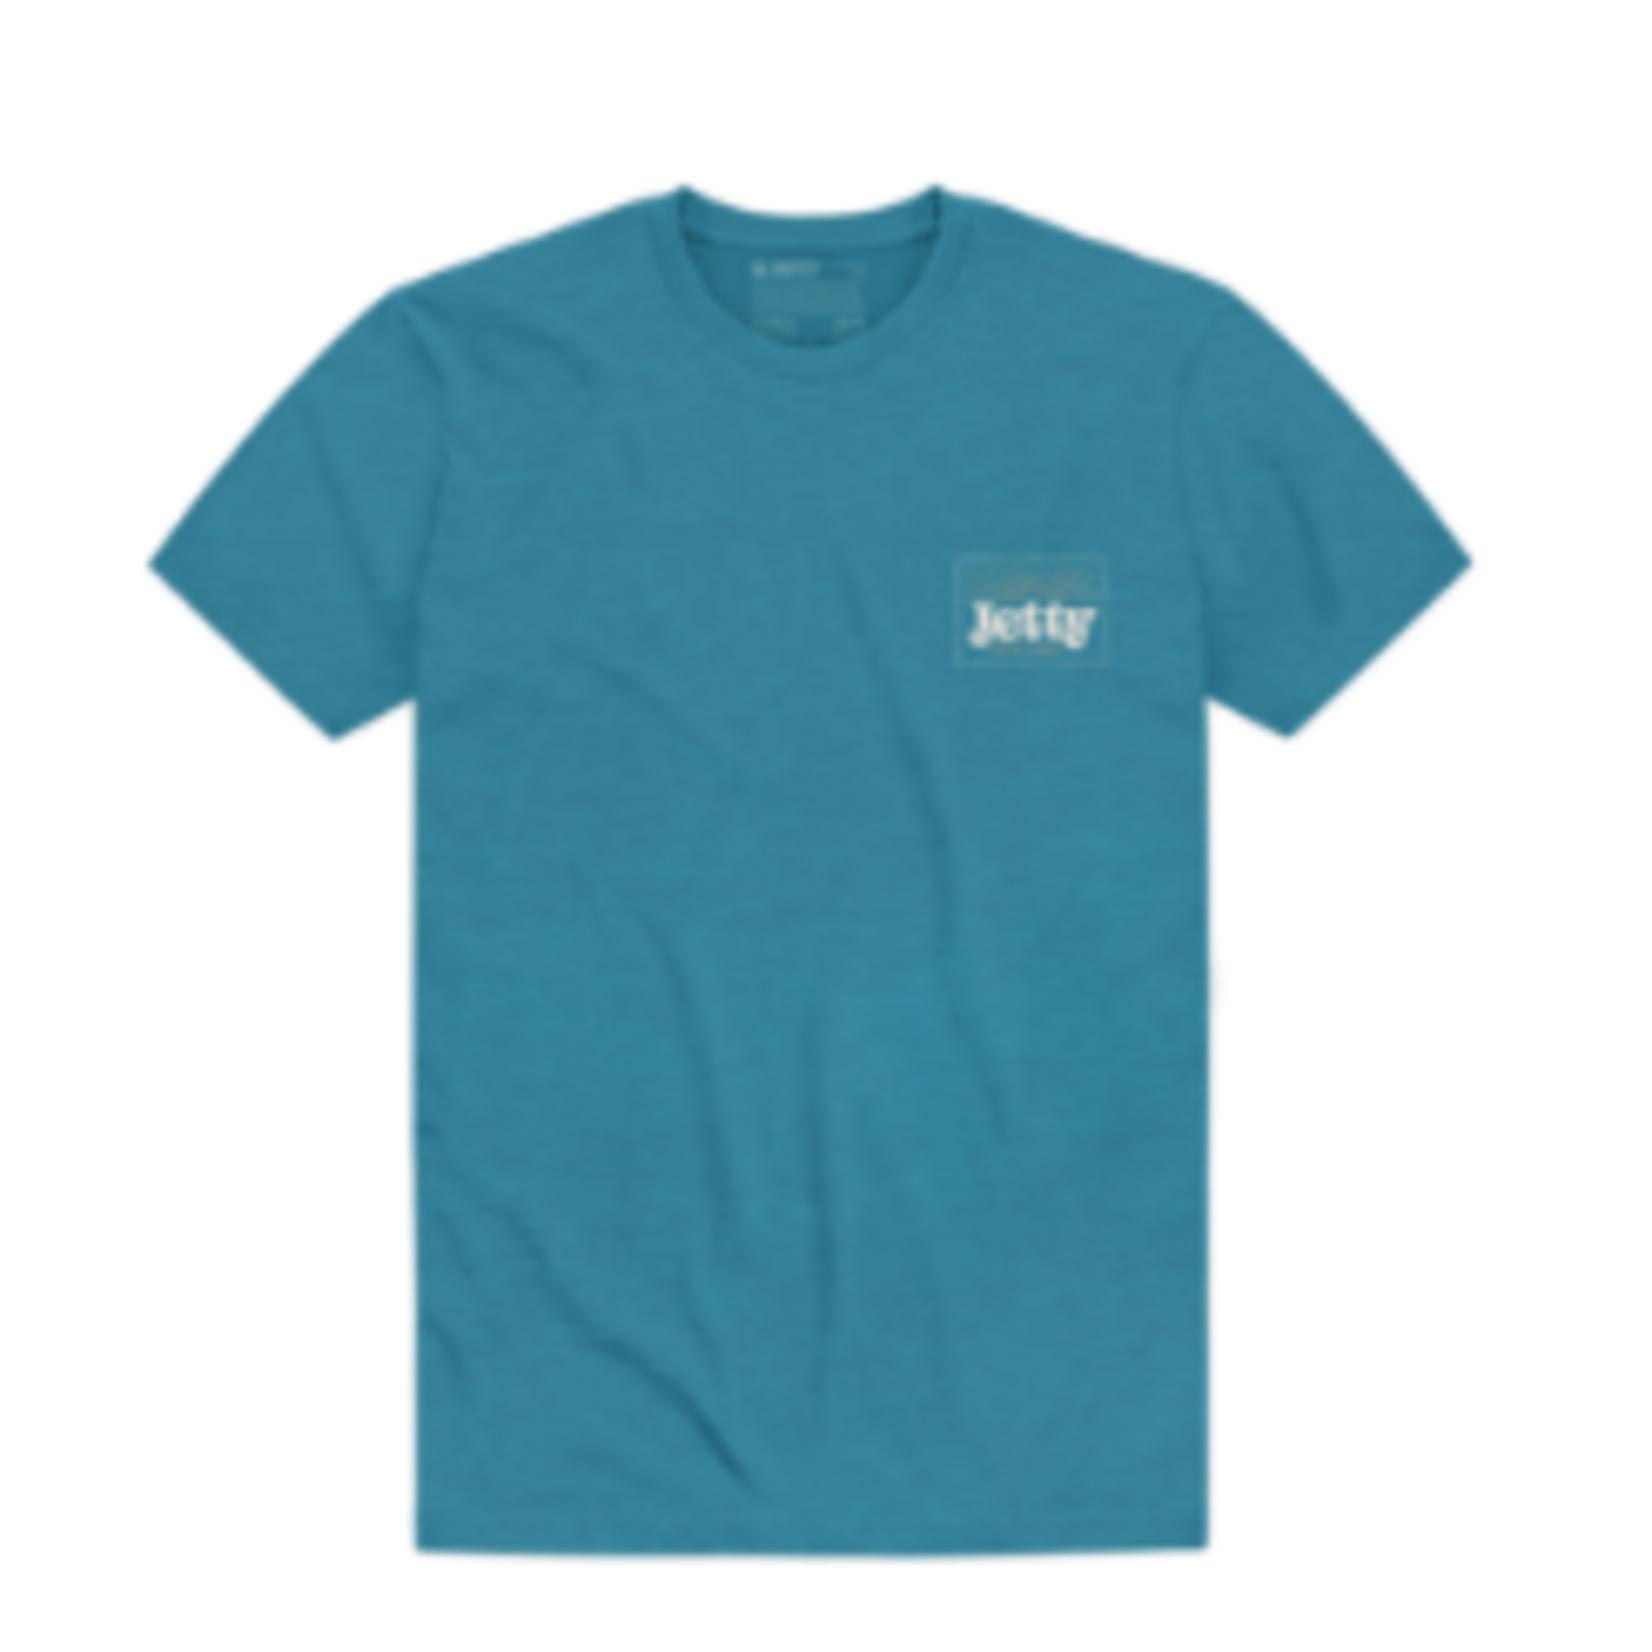 Jetty Jetty Sandbox Tee